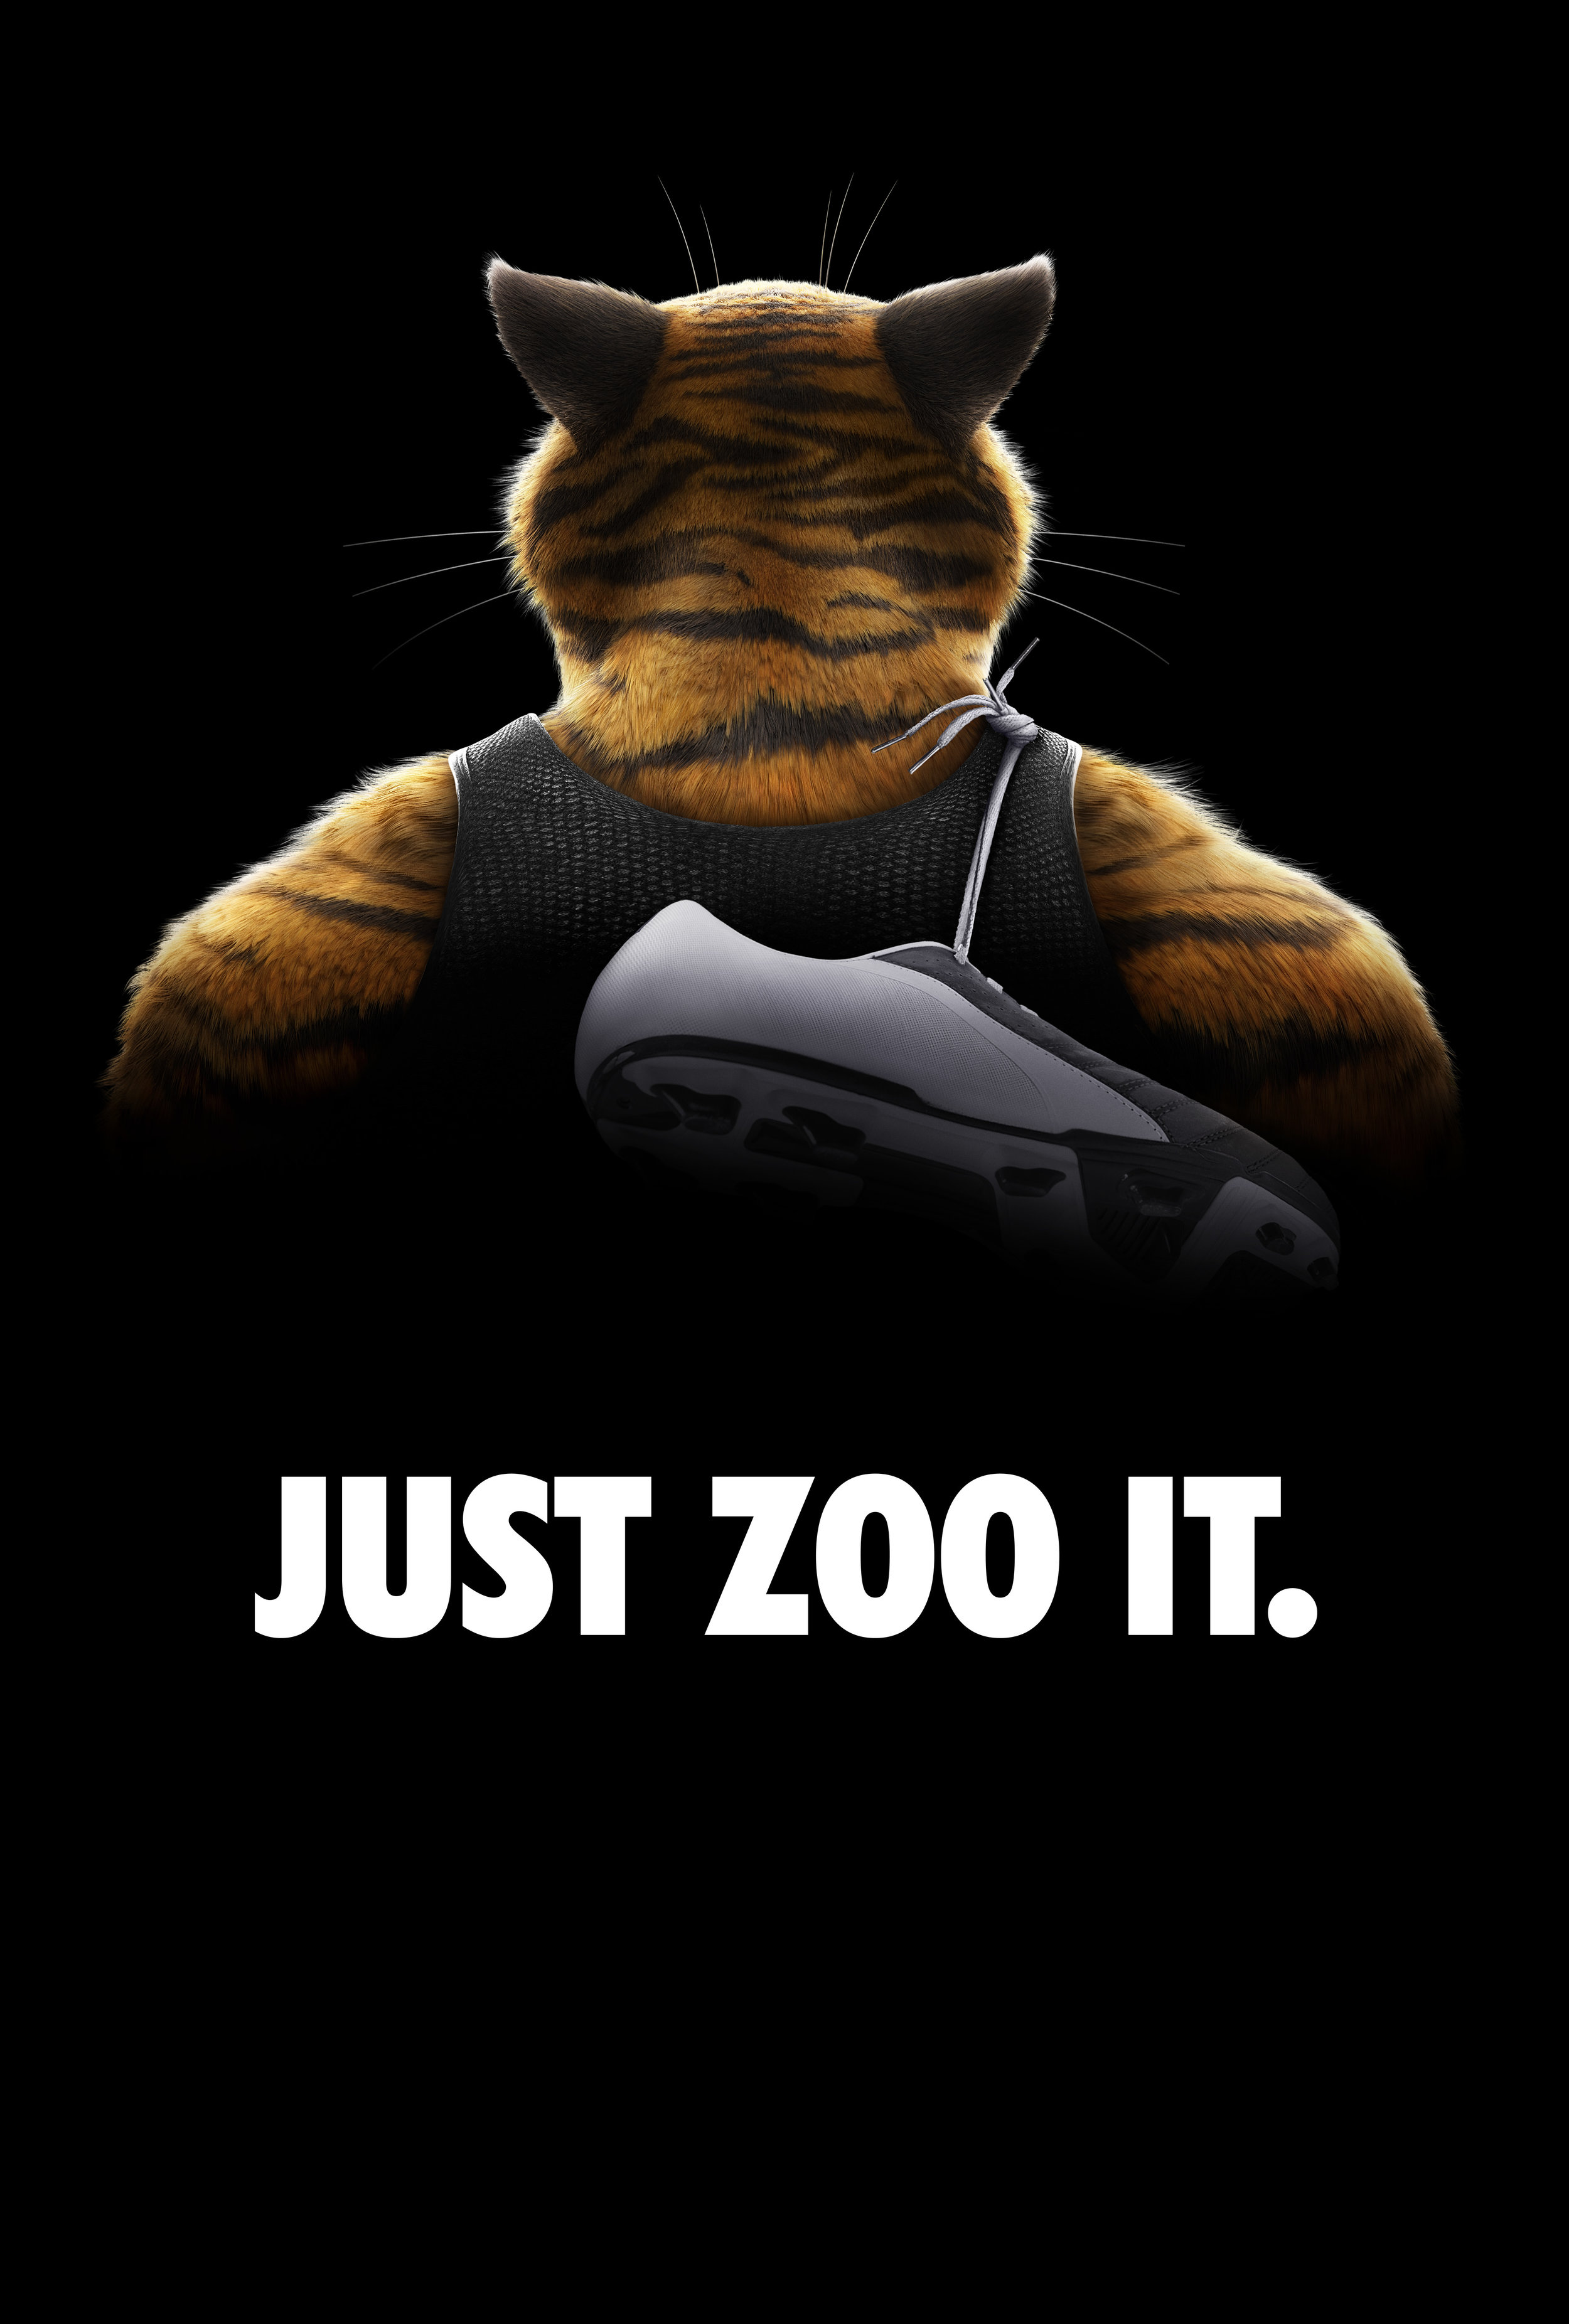 Zootopia_Zoo_It_Ad_v7.0.jpg